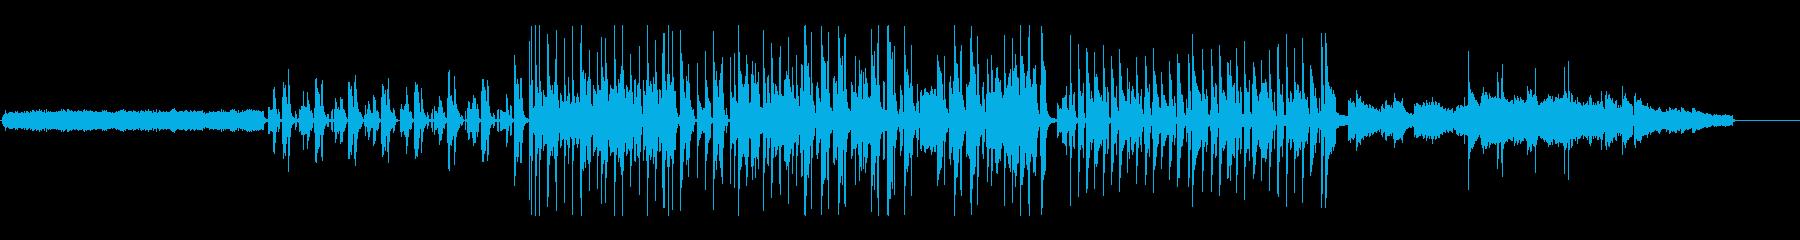 70's映画風にエレピとオルガンで追跡の再生済みの波形